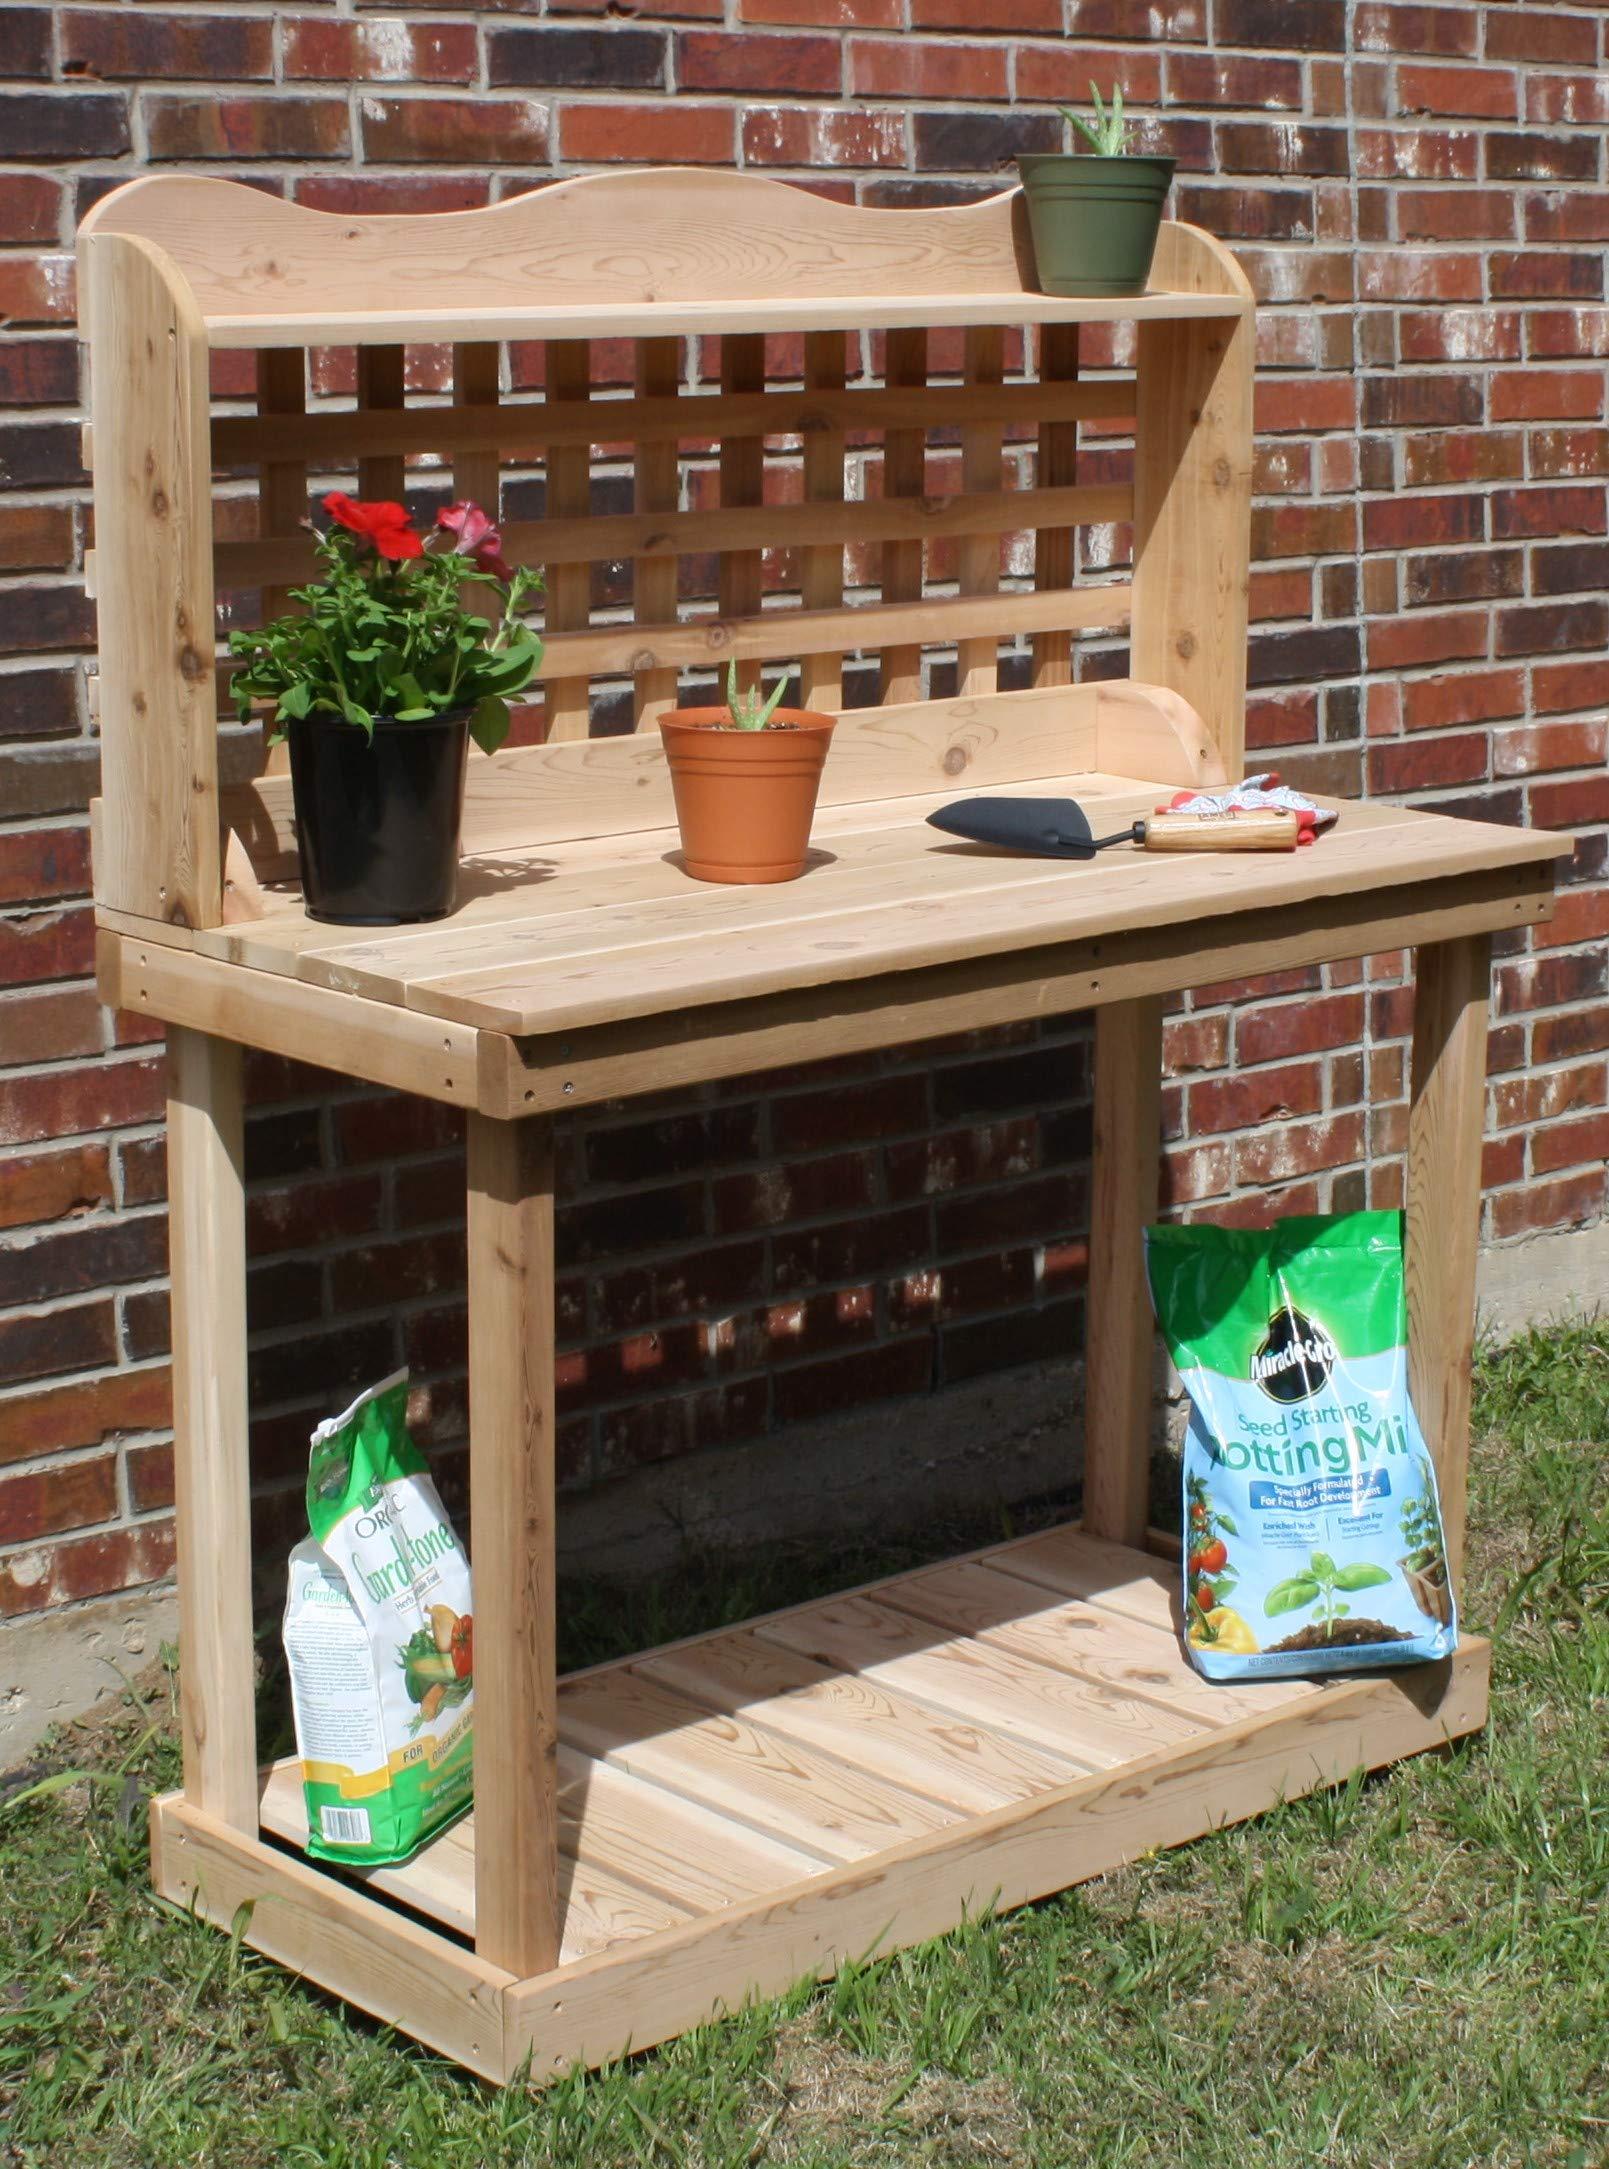 THREE MAN Cedar Decorative Lattice Gardening Potting Bench - 6 Foot Natural by THREE MAN (Image #1)